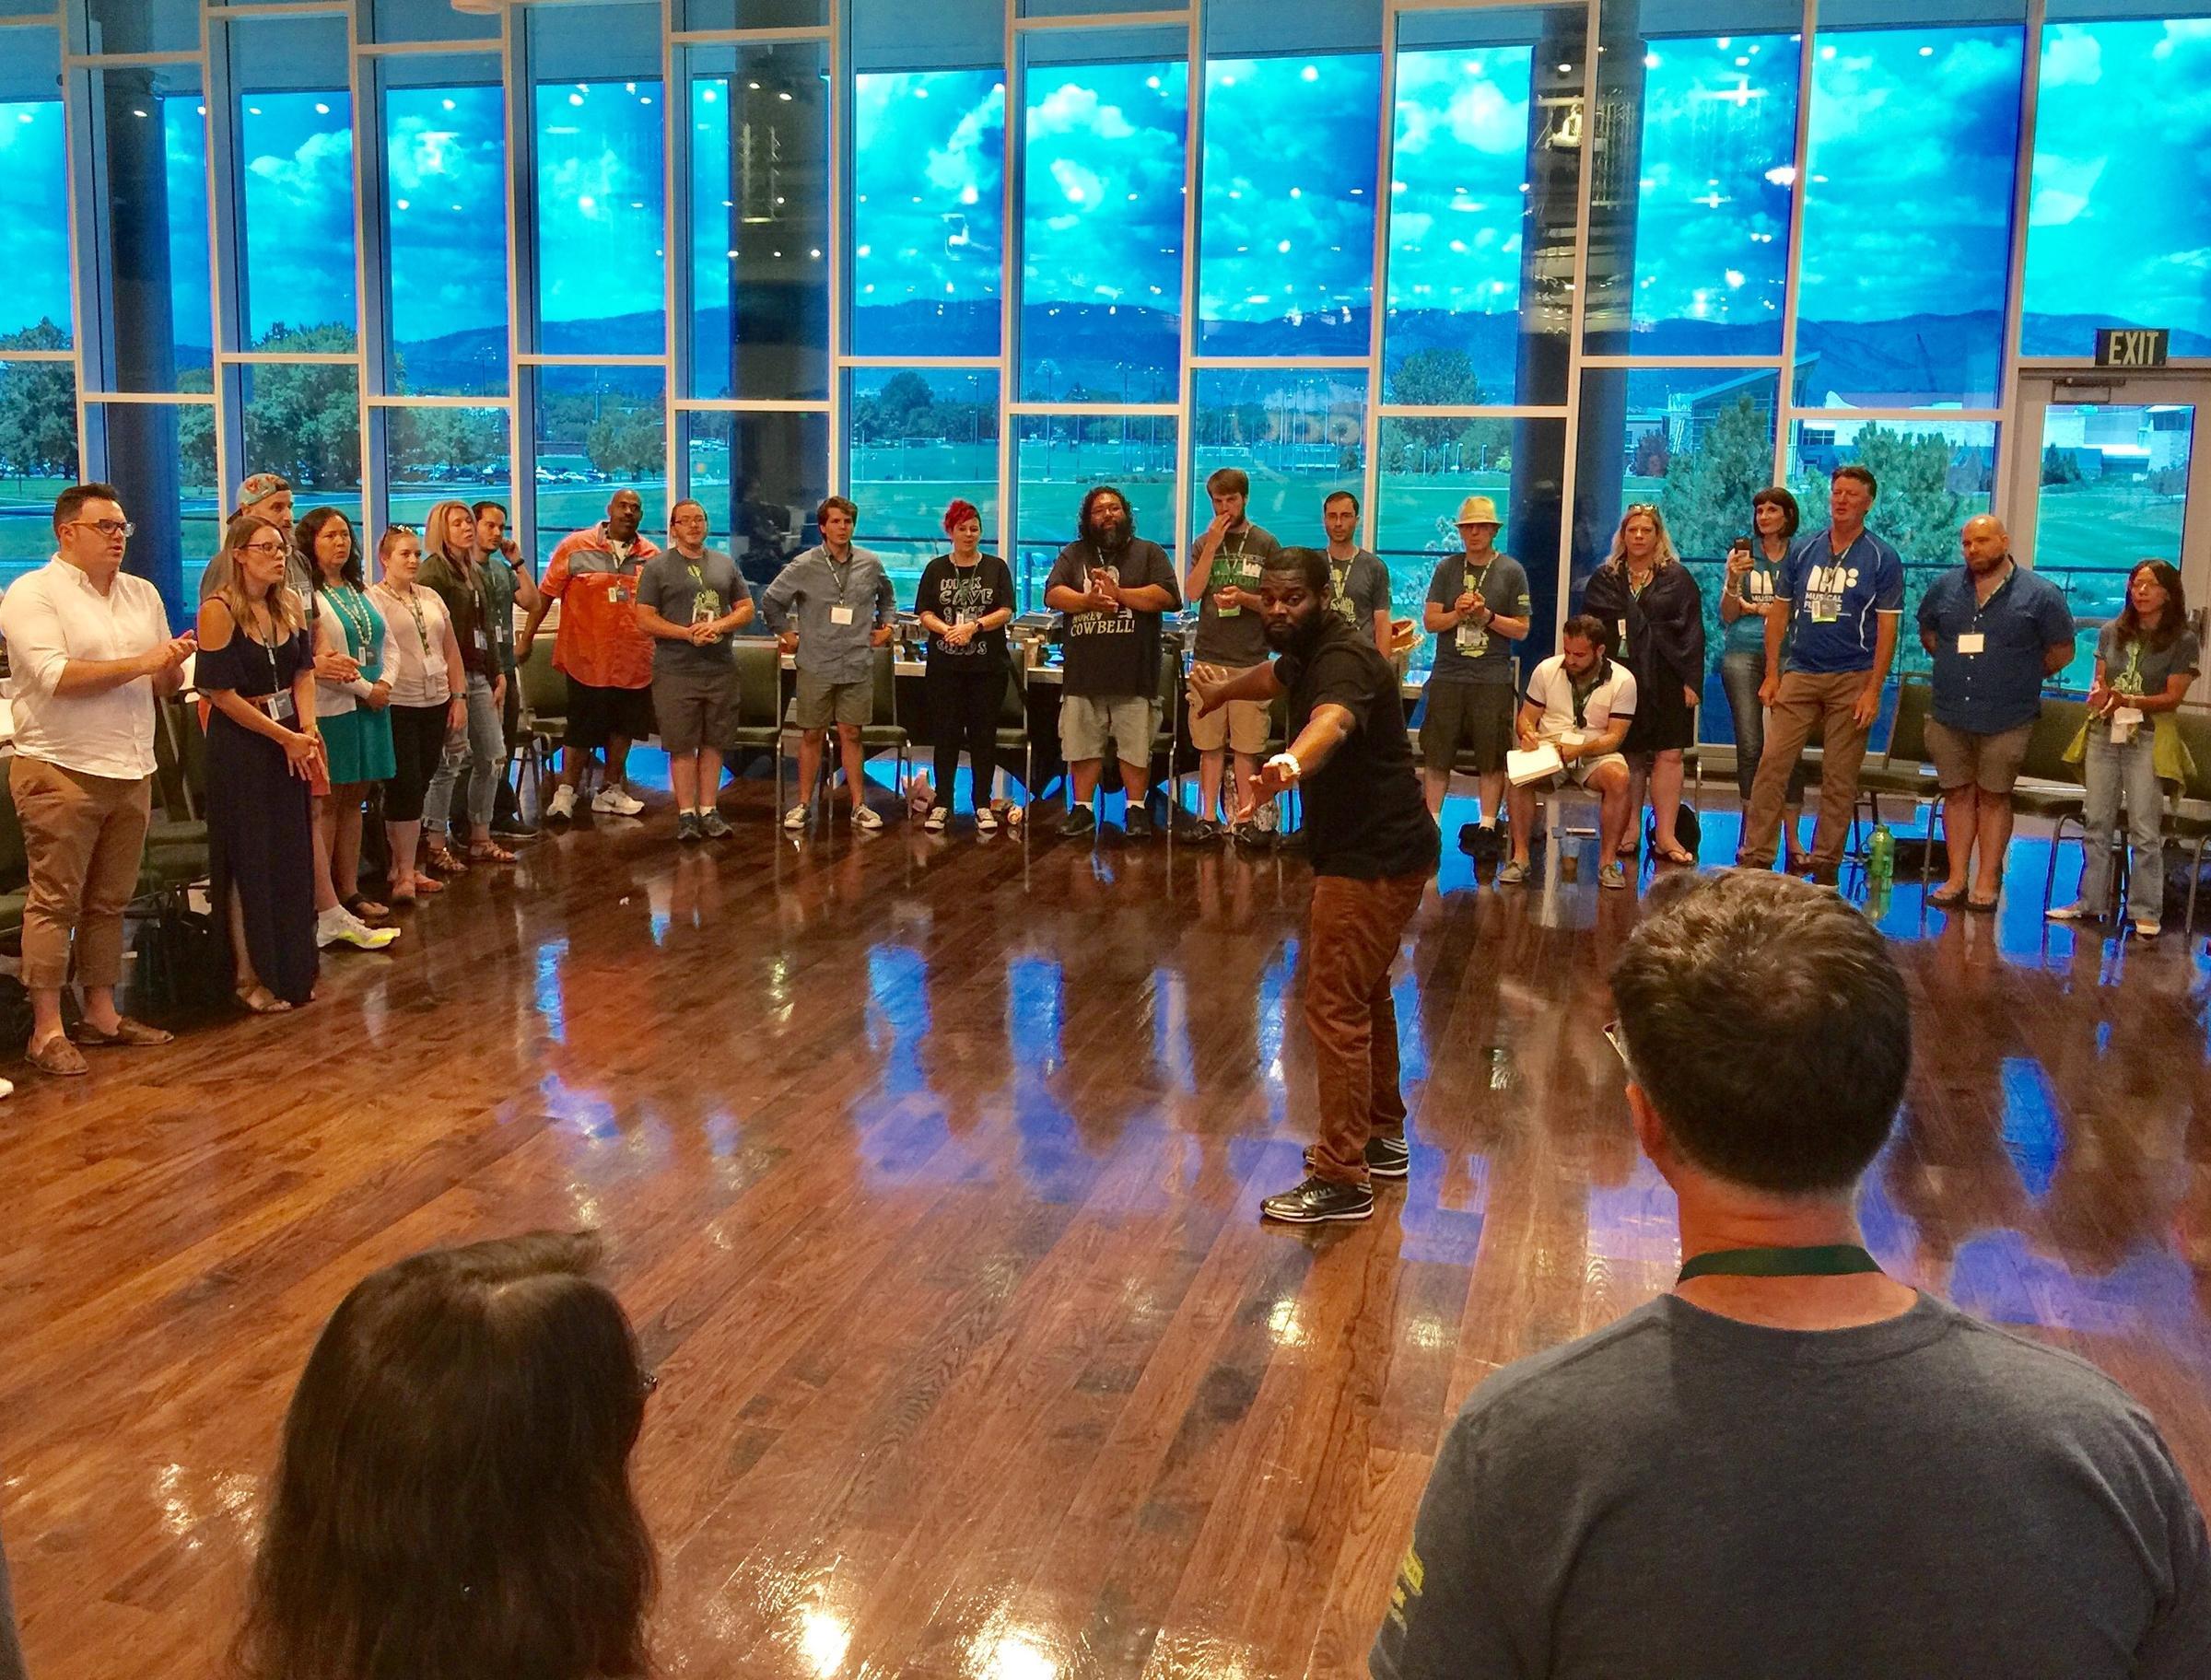 Little Kids Rock' Turns Teachers Into Guitar Heroes | KUNC